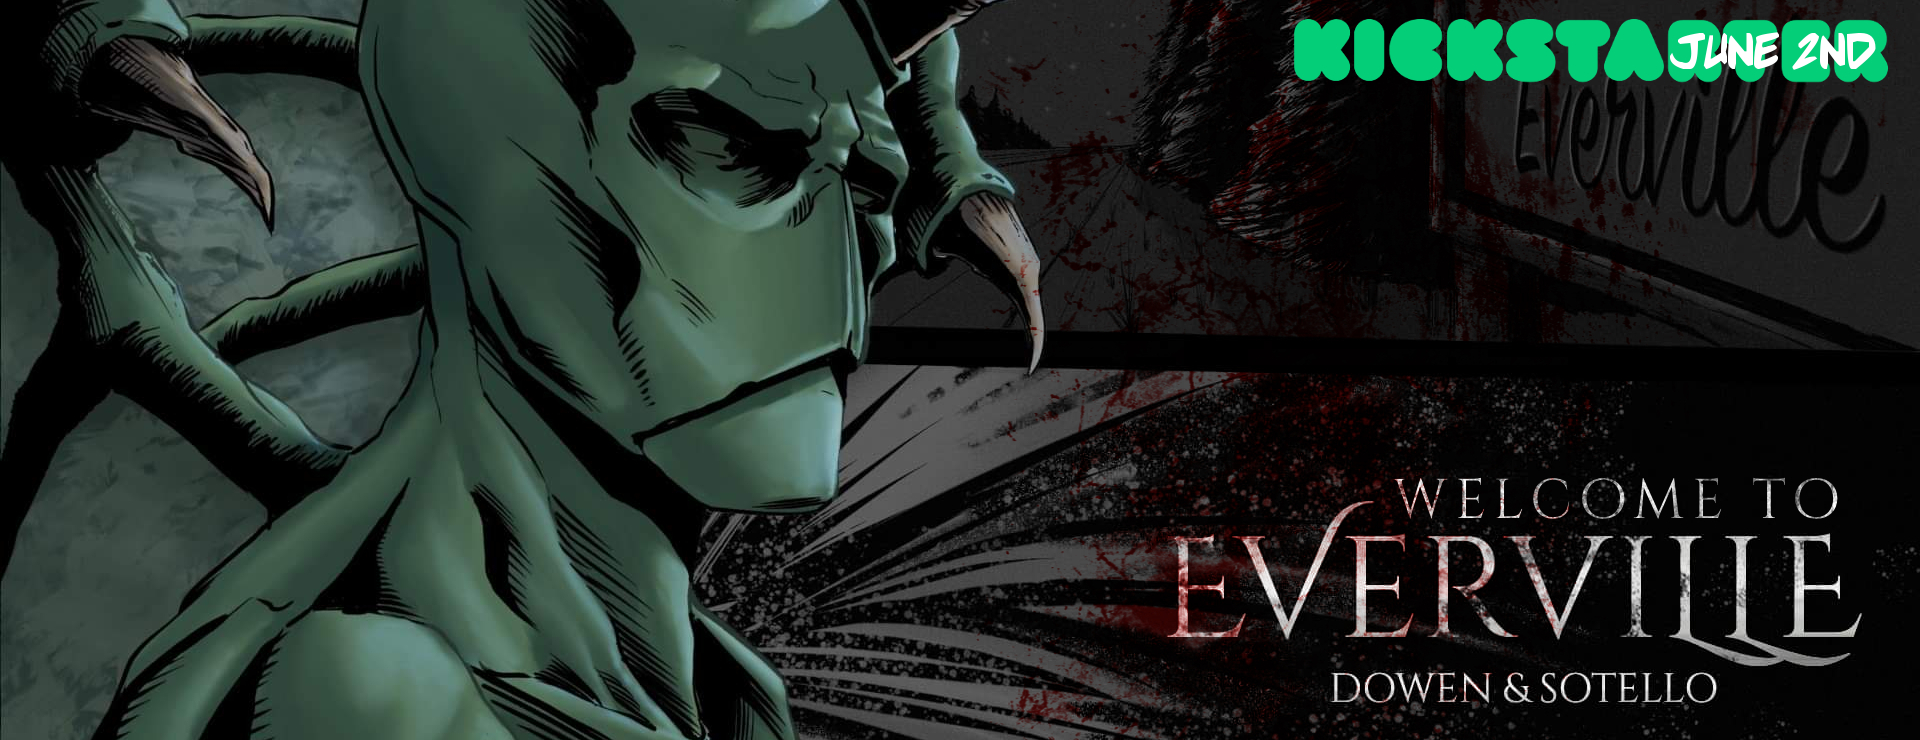 Evervillewebsiteheader